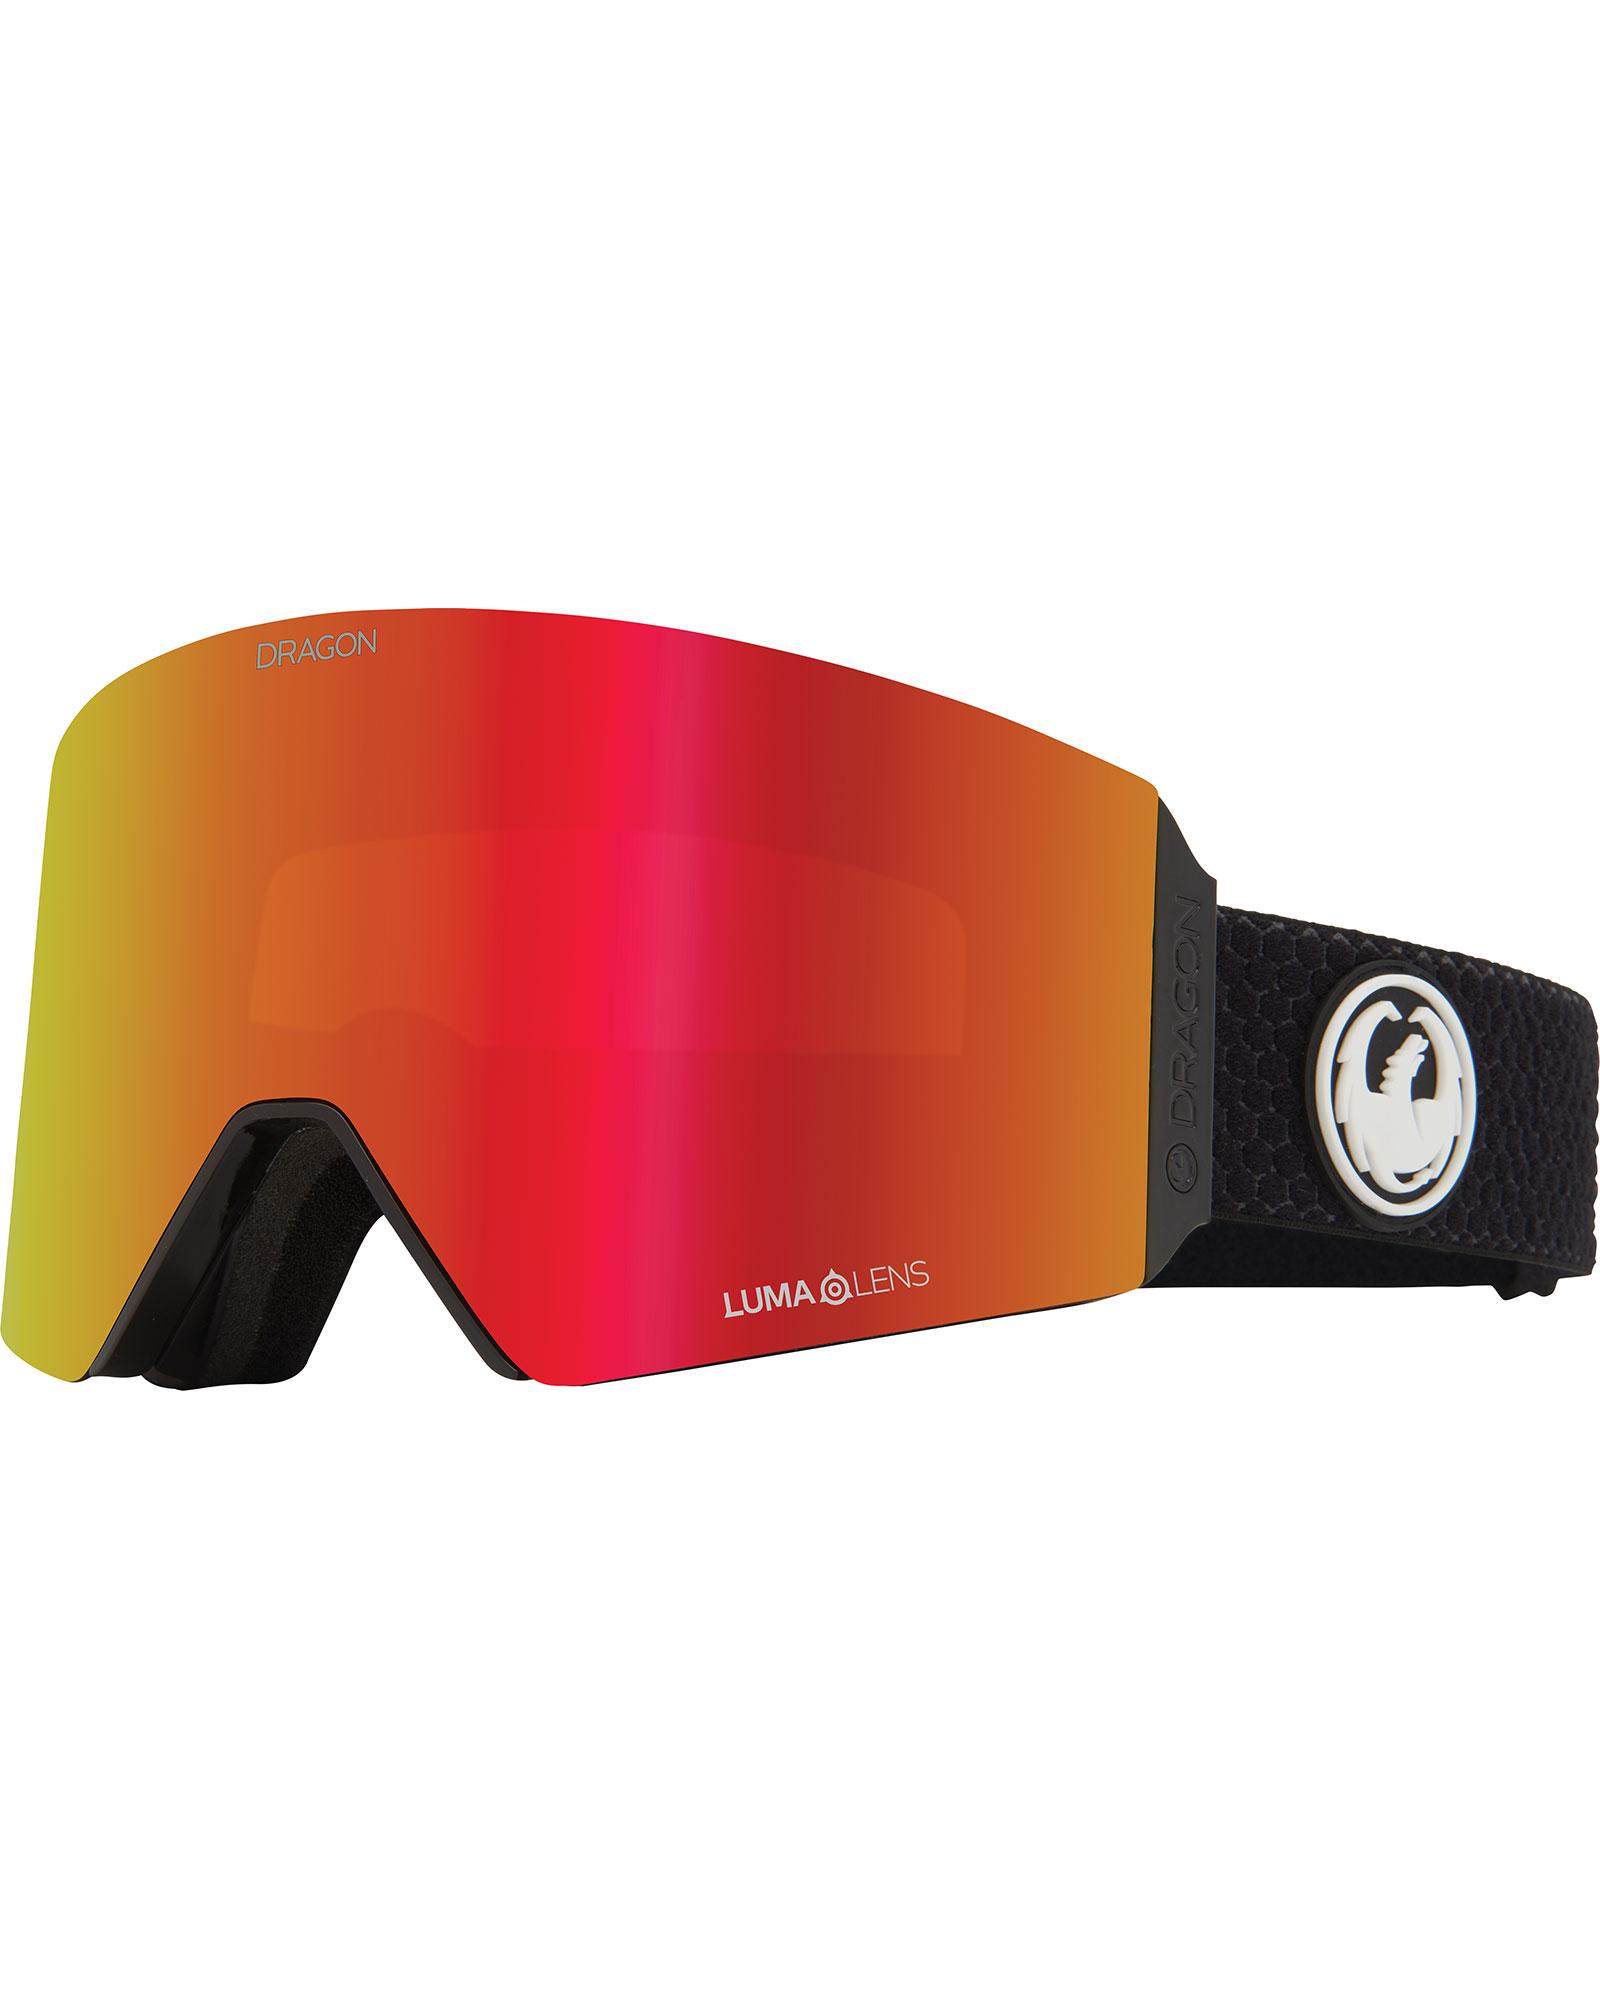 Dragon RVX Split / Lumalens Red Ionized + Lumalens Light Rose Goggles 2020 / 2021 0